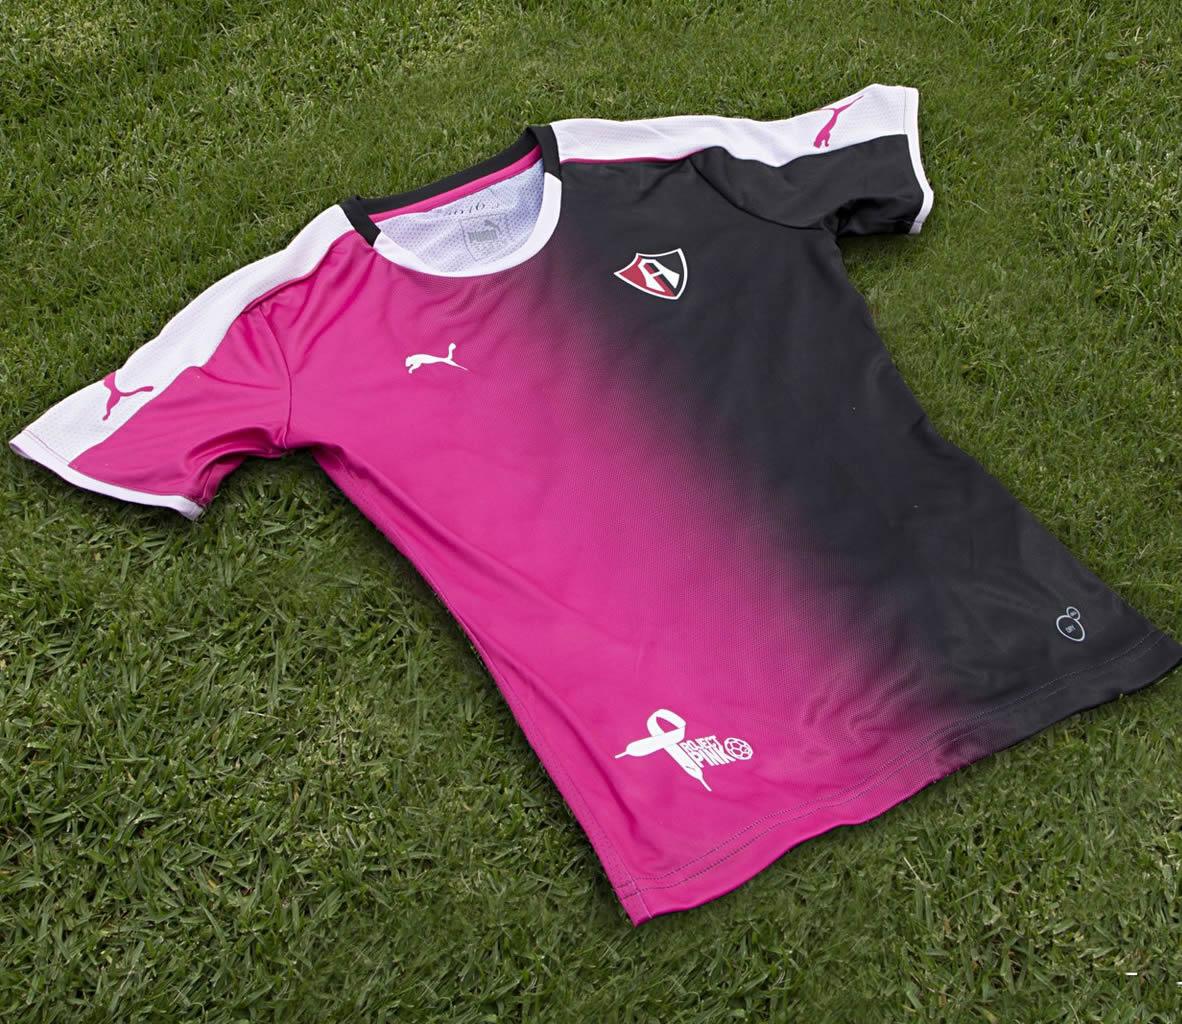 Casaca rosa del Club Atlas FC | Foto Puma